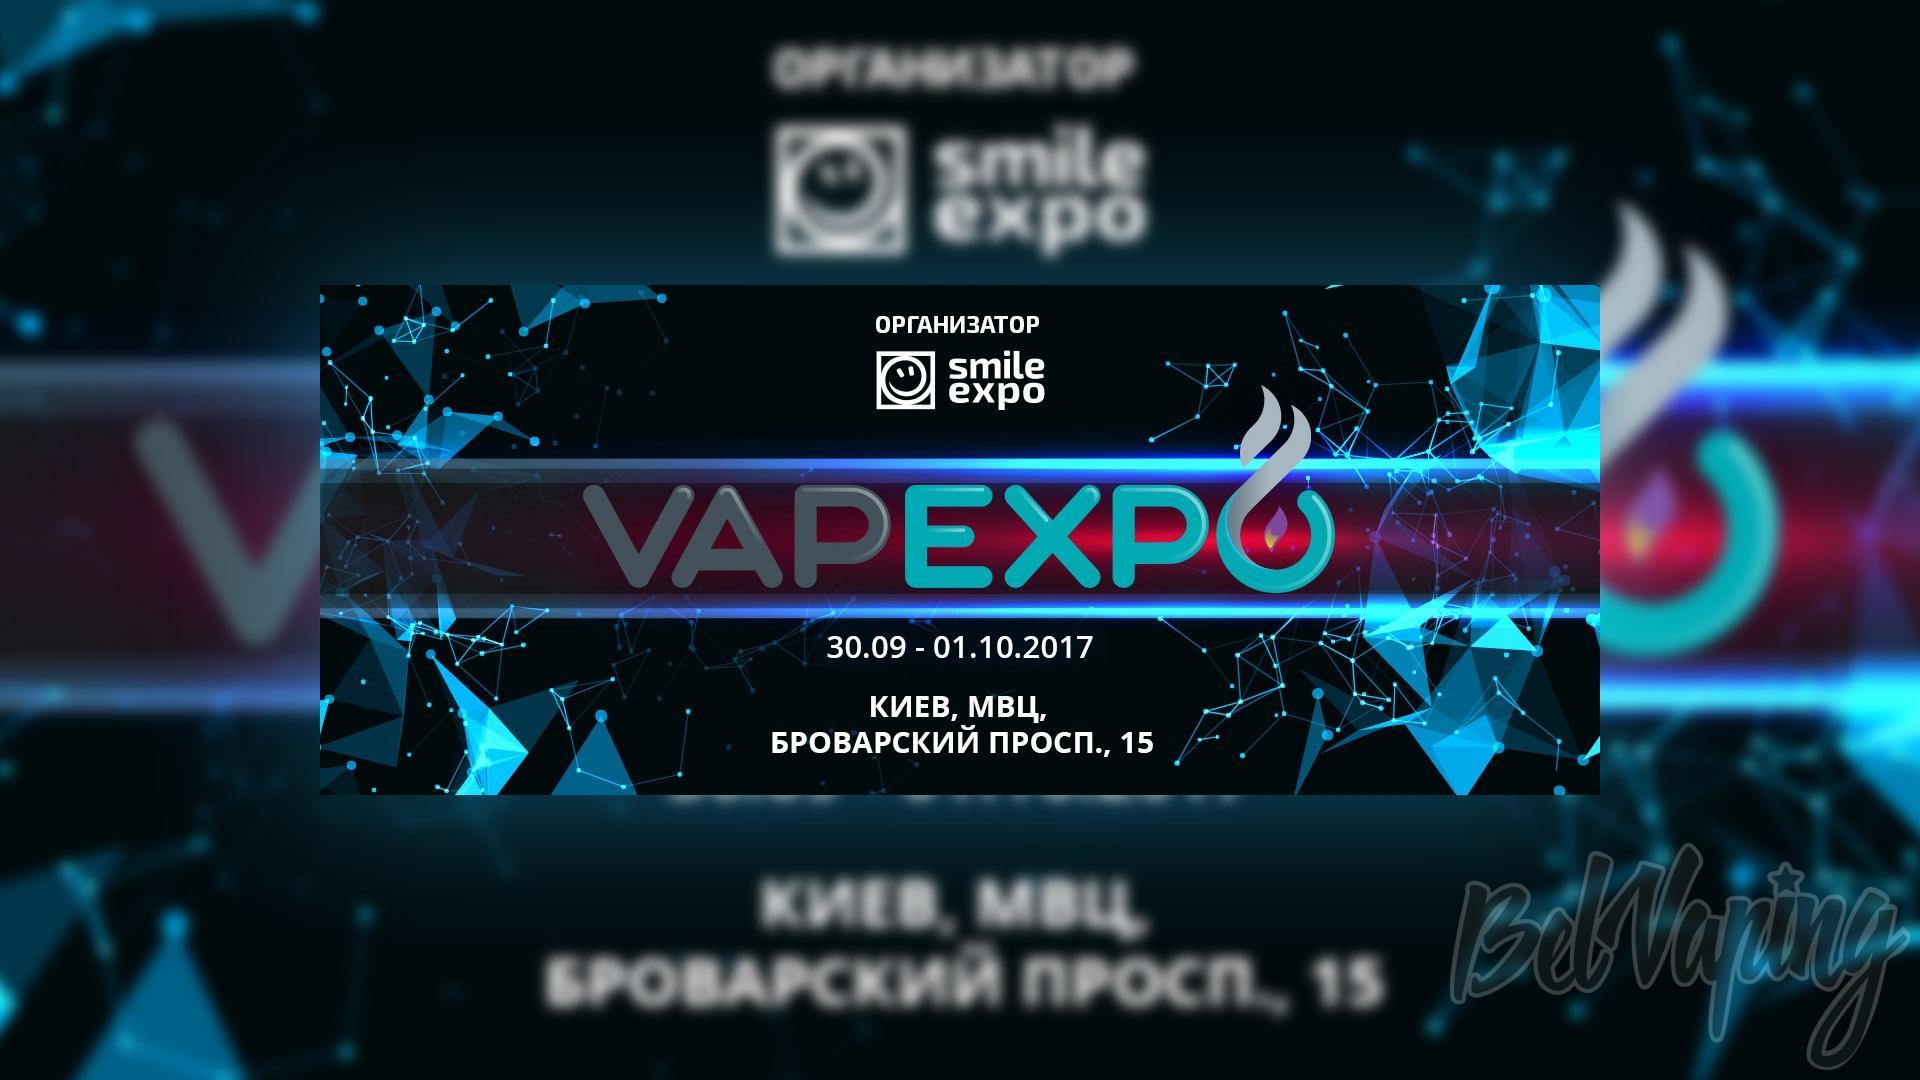 Выставка VAPEXPO Kiev 2017 с 30 сентября по 1 октября